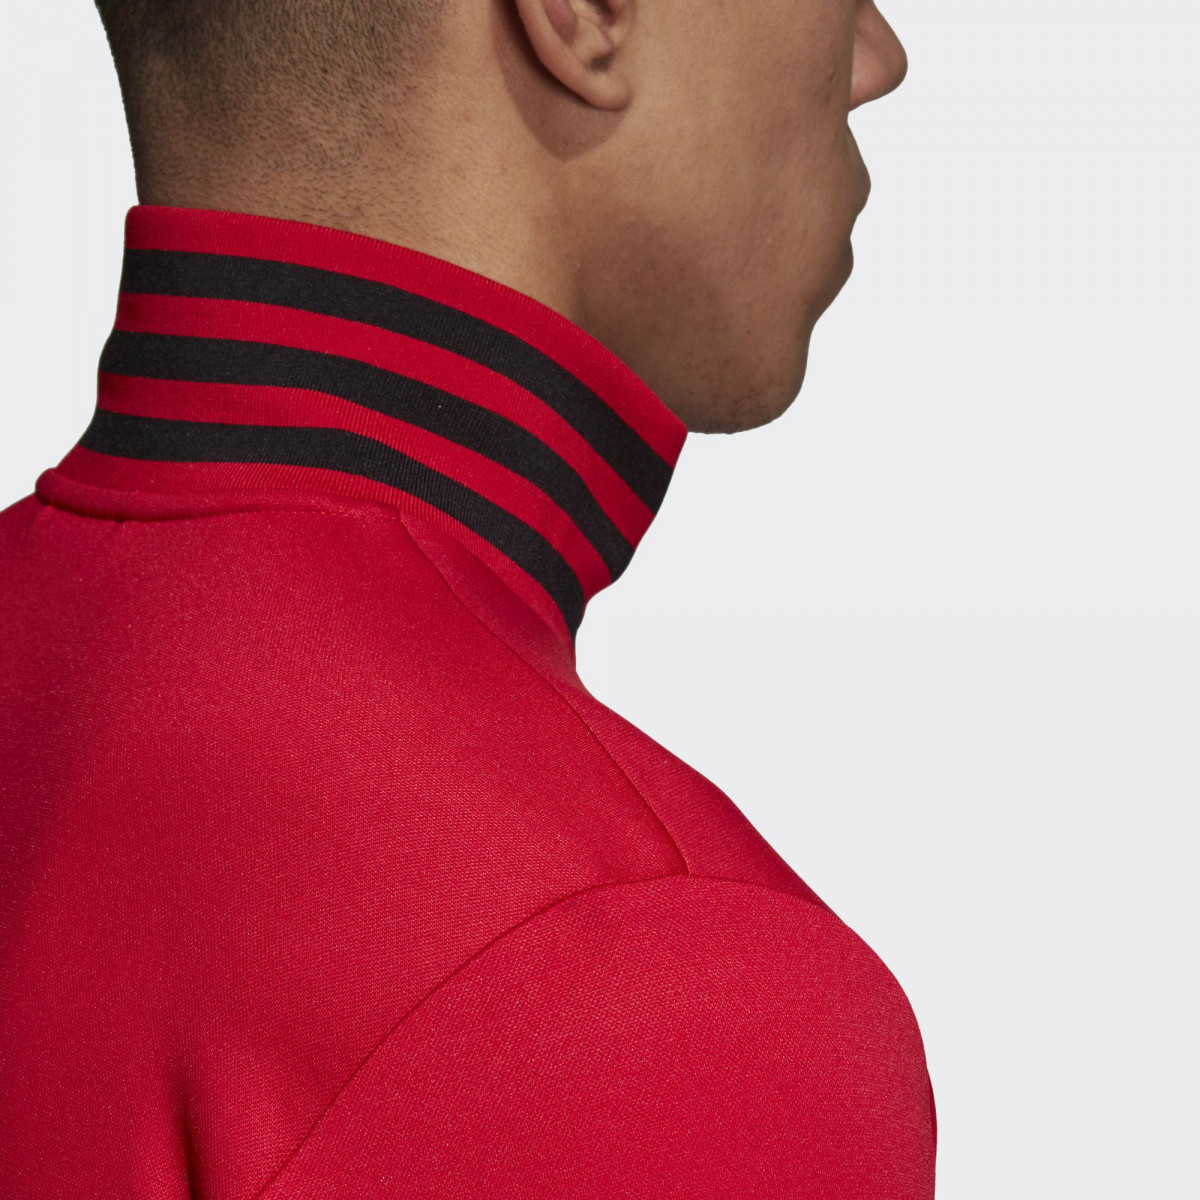 86324cf3d10 adidas Manchester United 3 Stripes Track Jacket - Soccer Shop ...